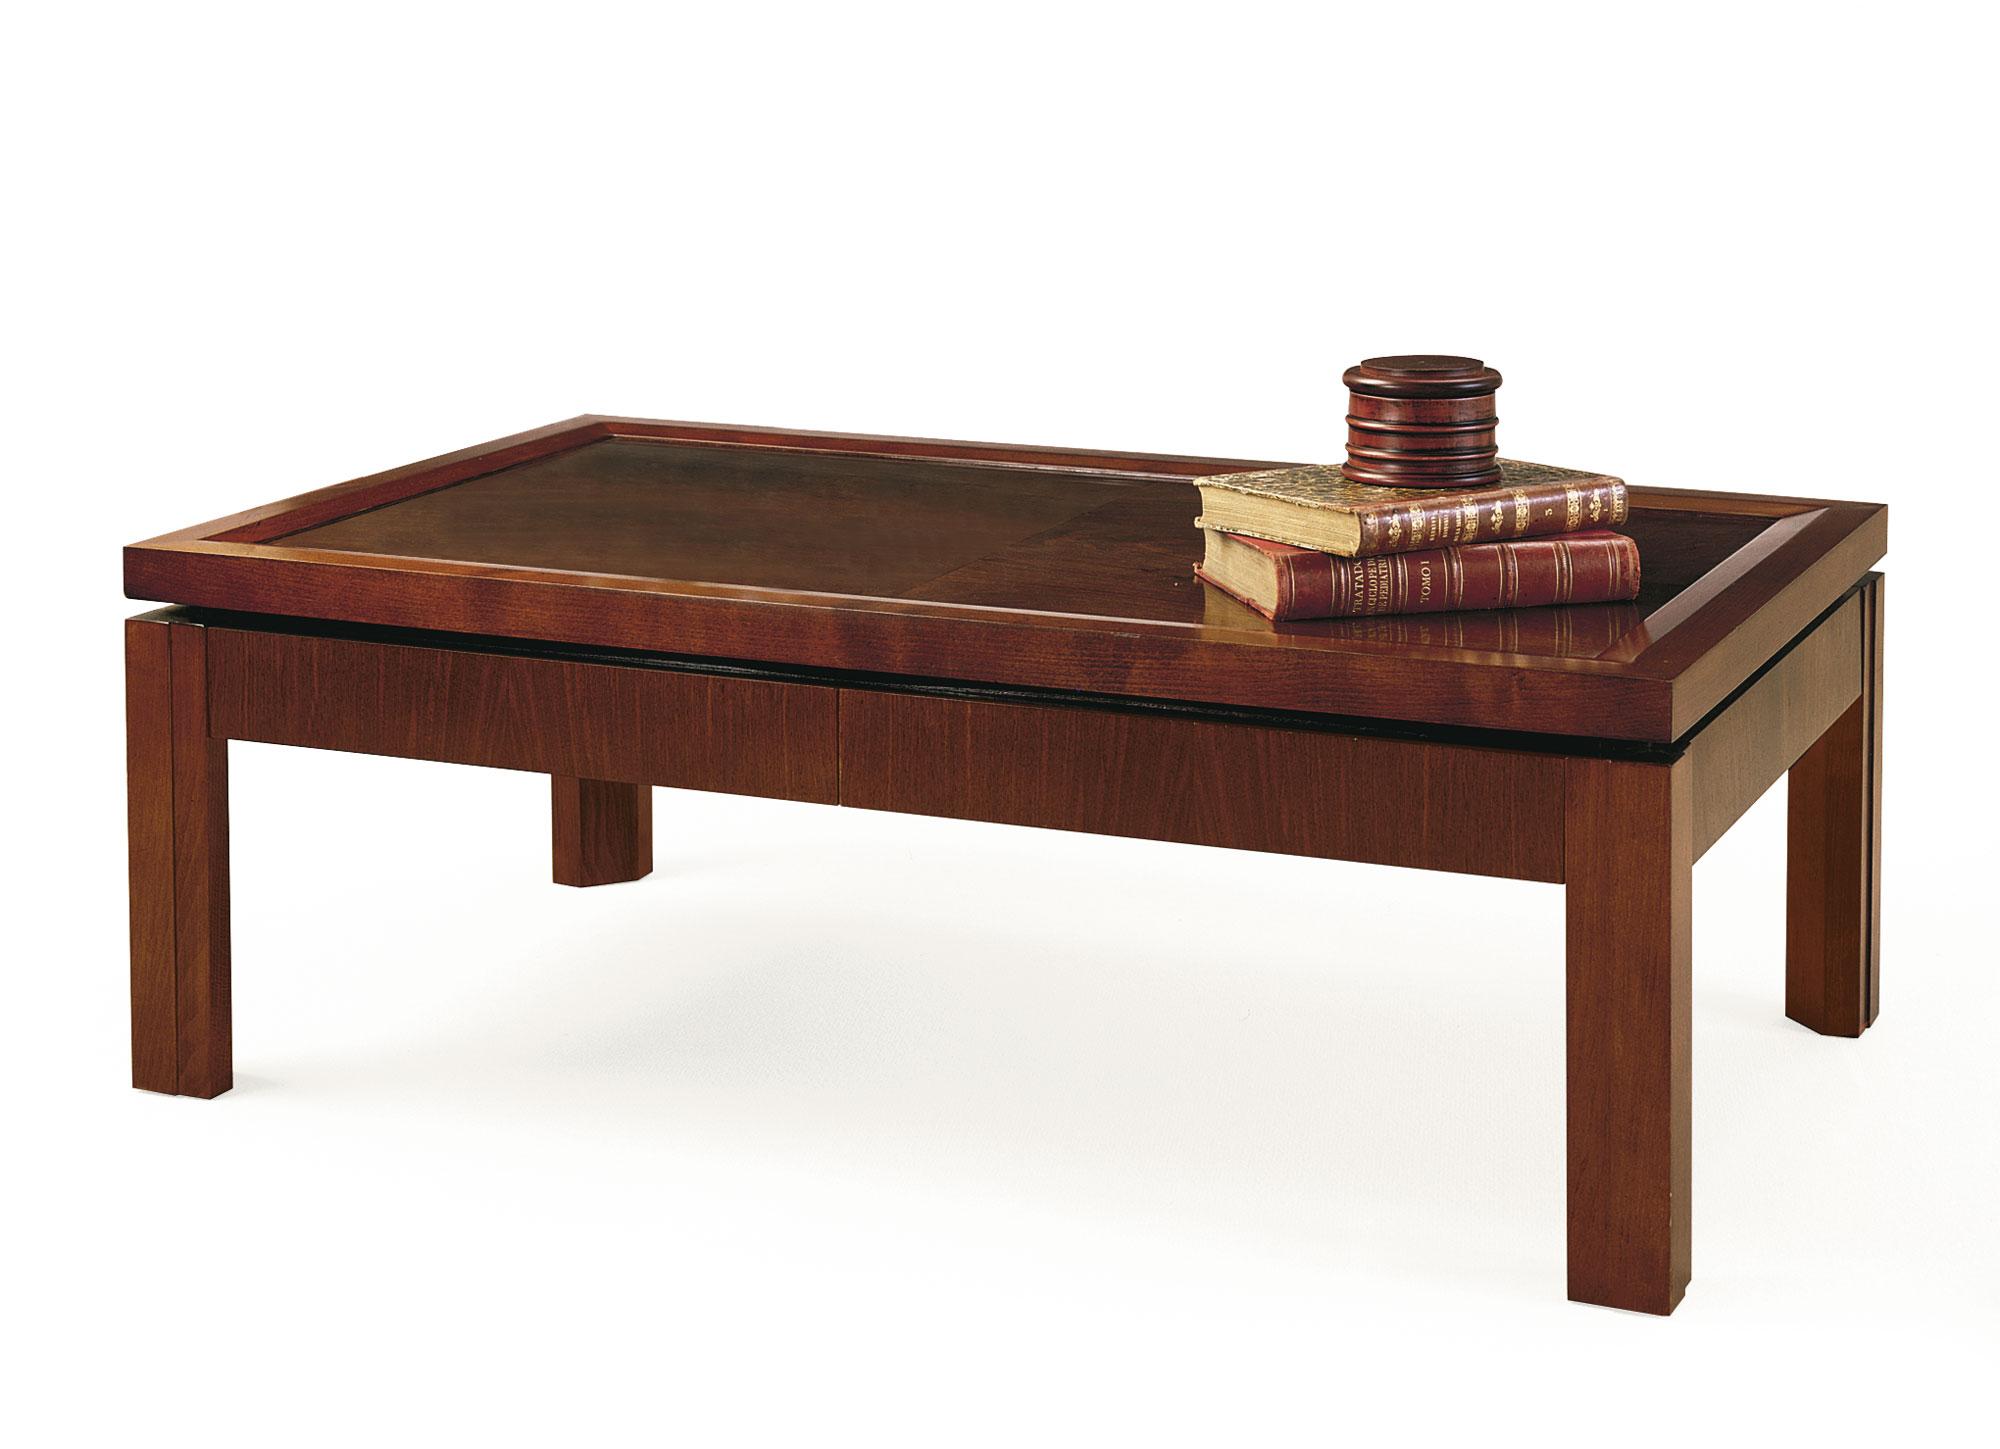 Muebles de estilo obtenga ideas dise o de muebles para for Estilo hogar muebles